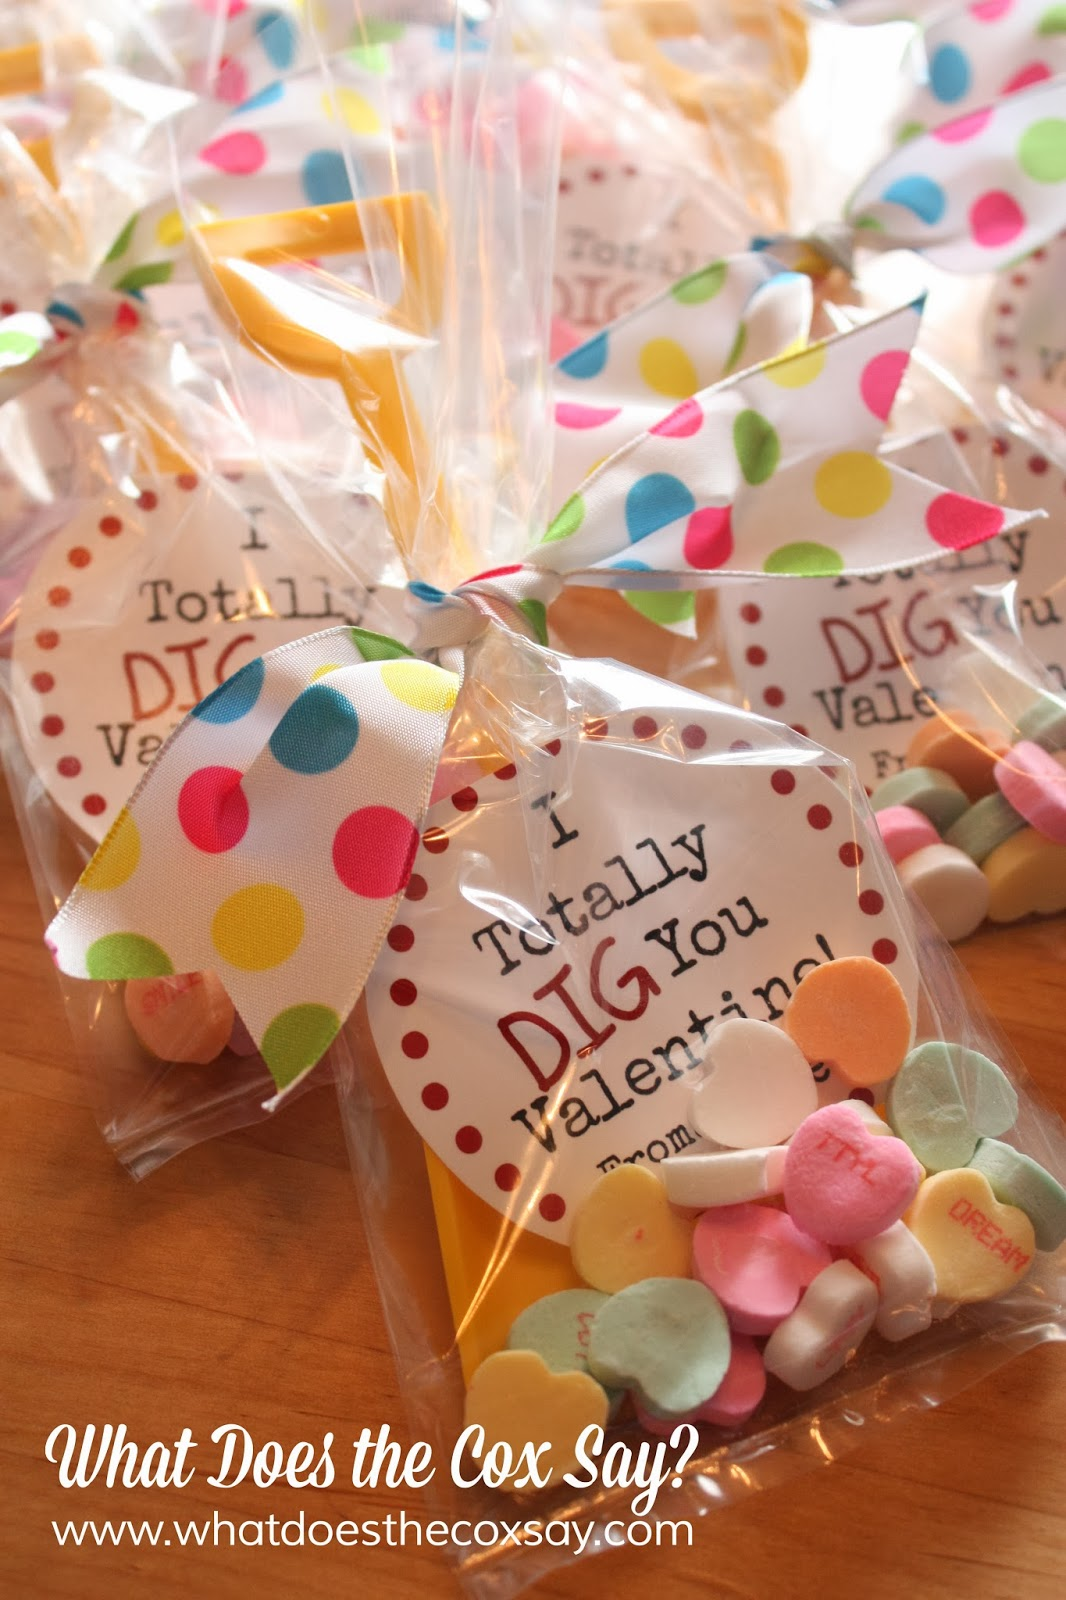 I Dig You Valentine Printable by whatdoesthecoxsay.com #printable #tutorial